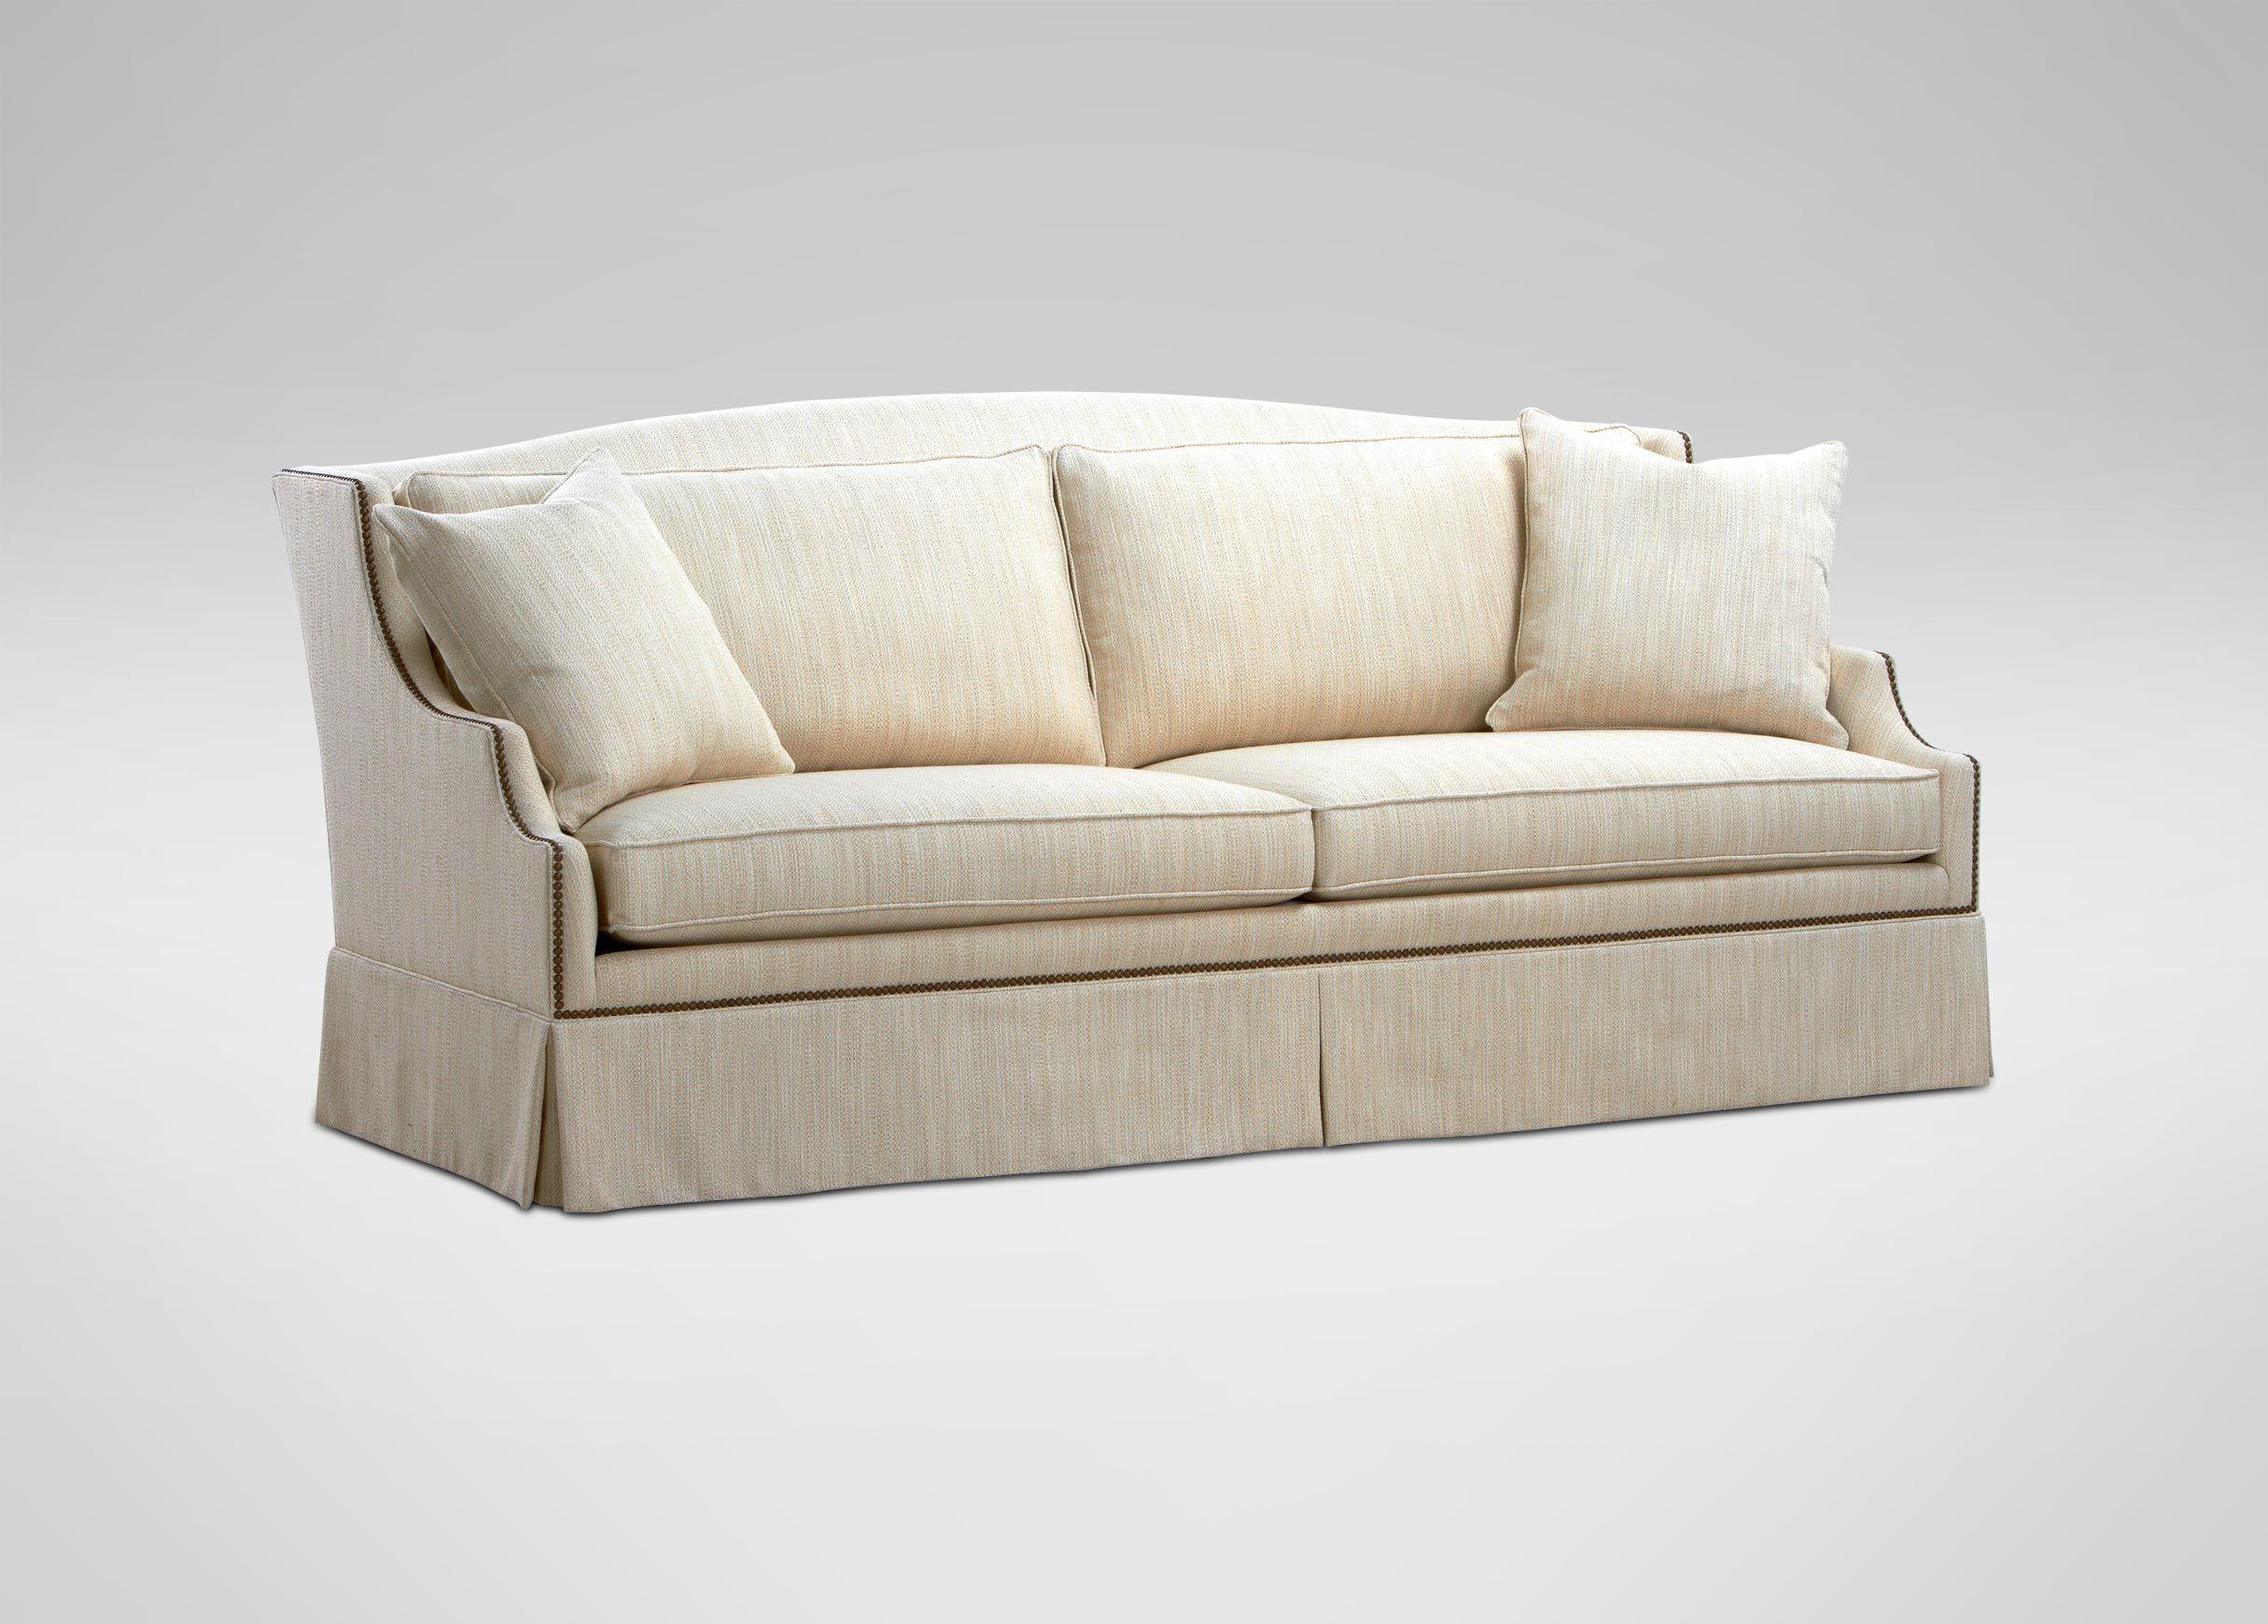 Phoebe Sofa | Sofas U0026 Loveseats | Furniture | Pinterest | Sofa, Living Room  Sofa And Love Seat